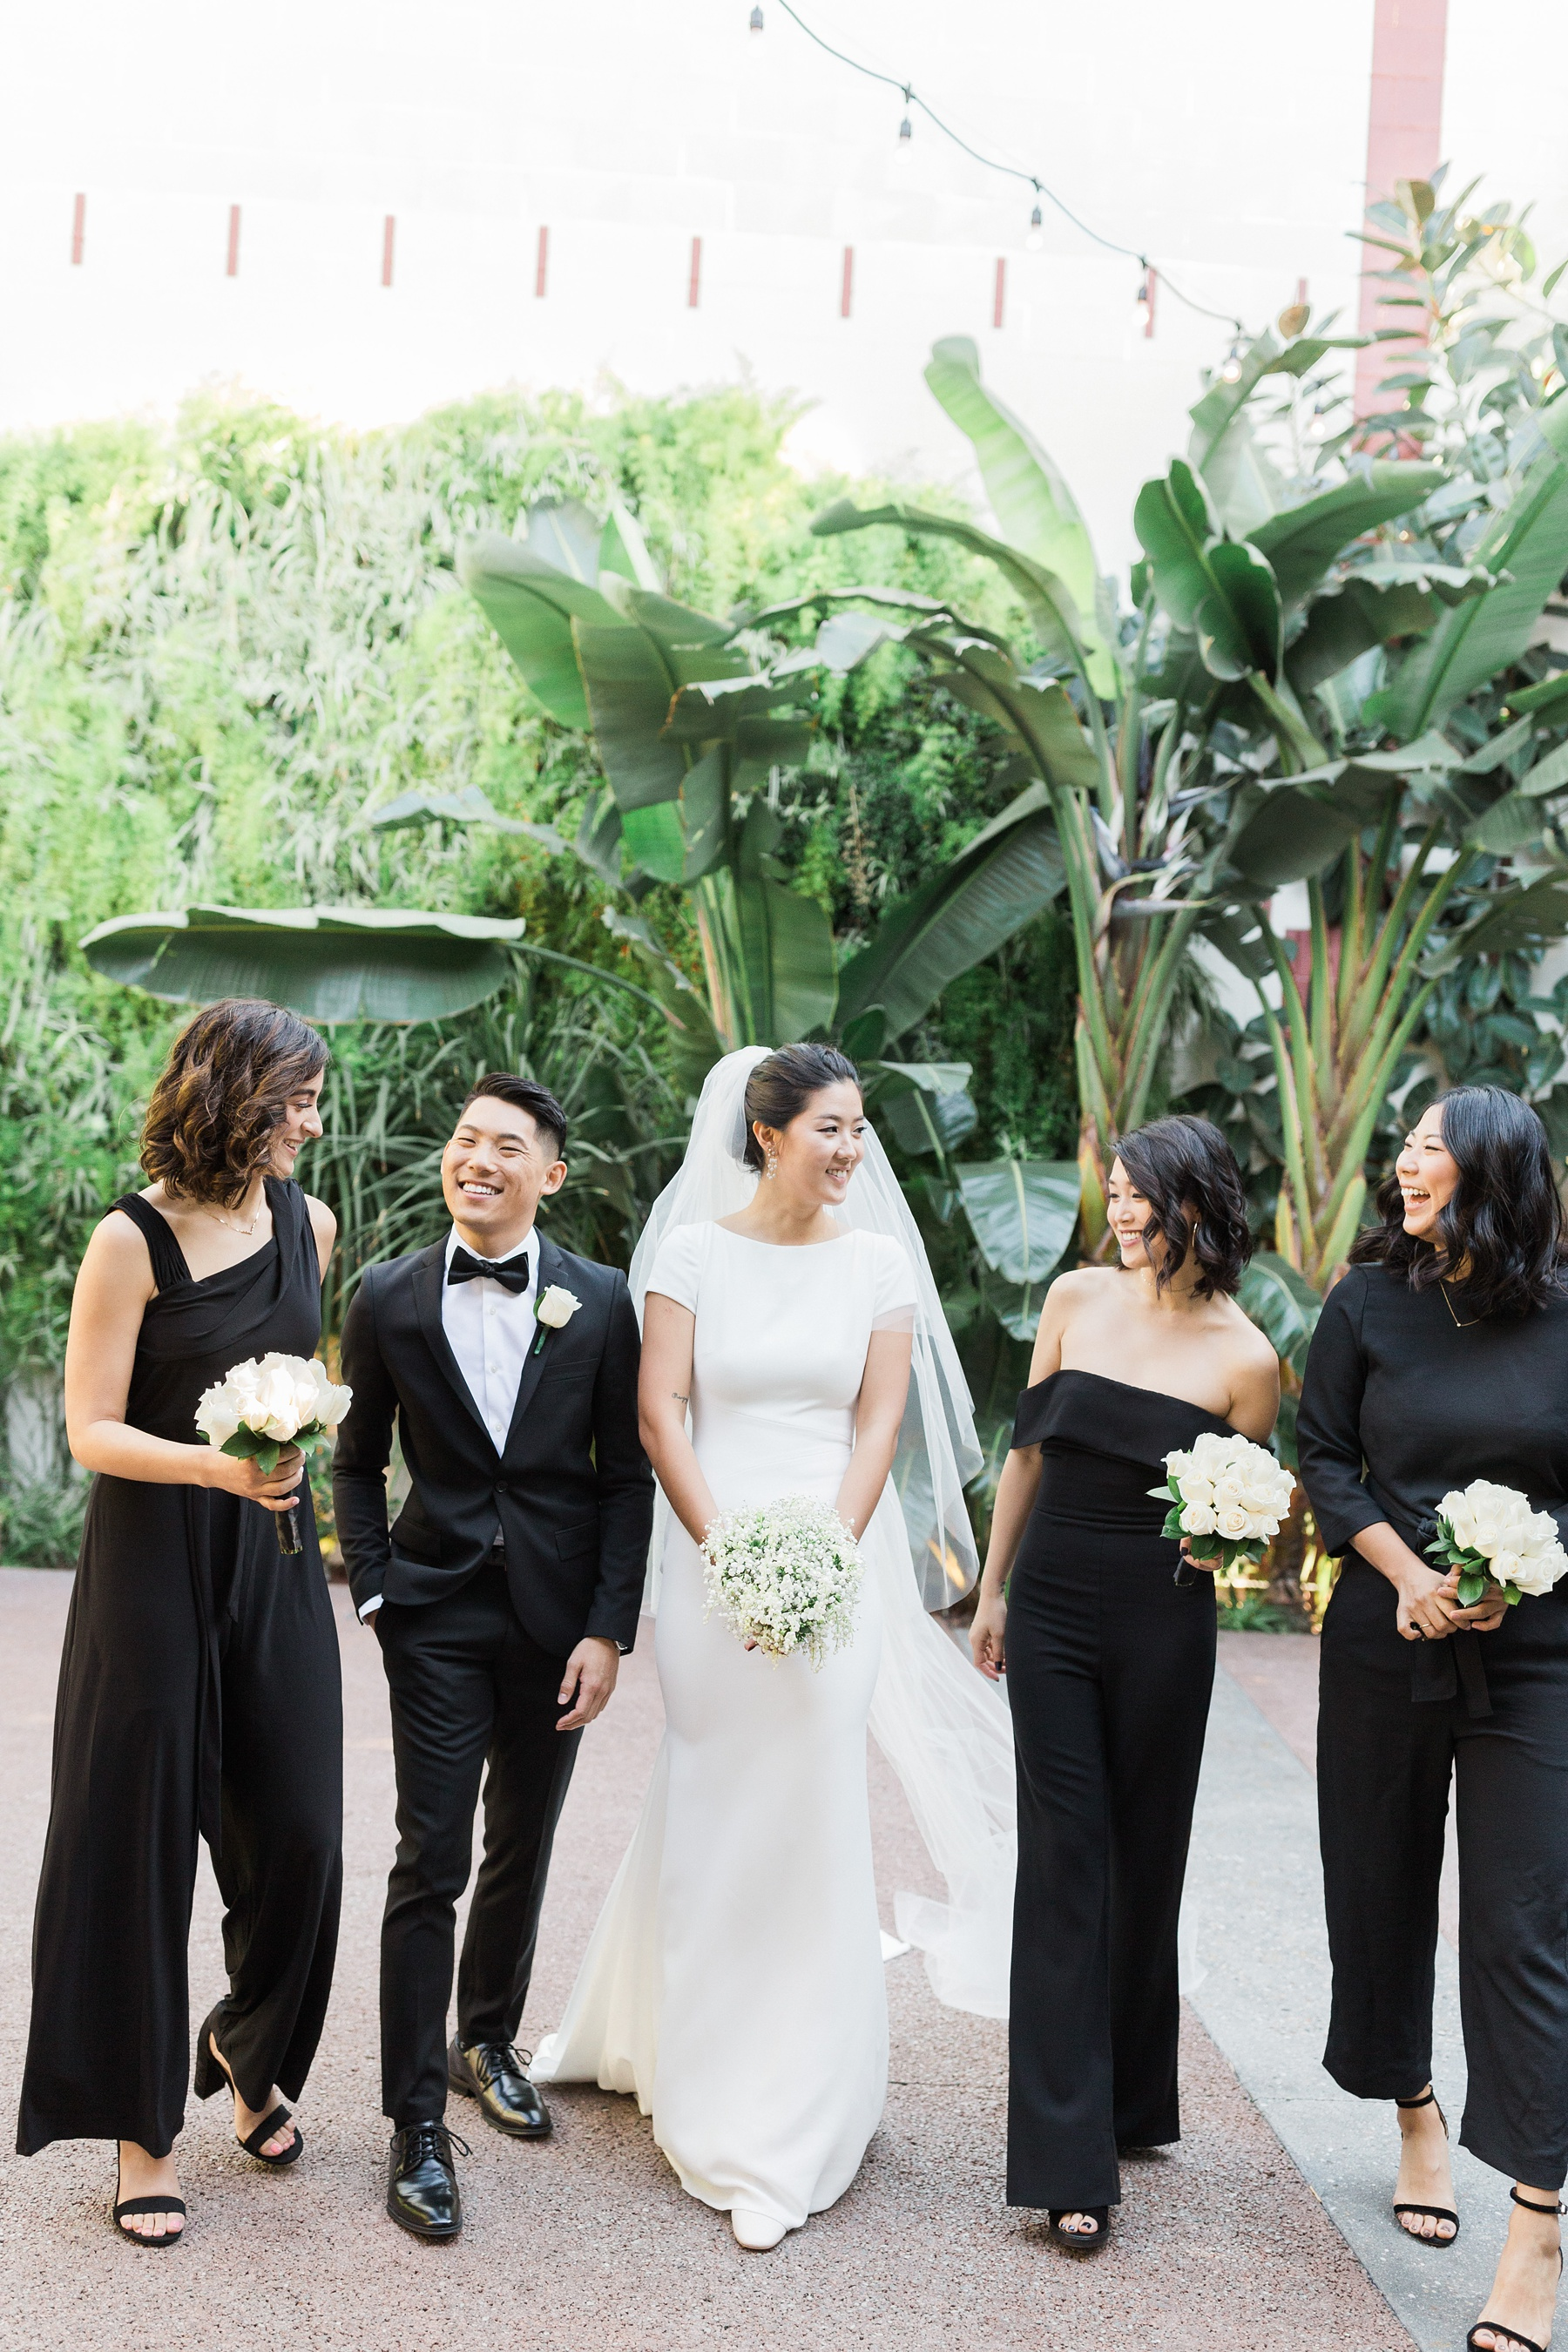 Urban DTLA Wedding at Millwick By Wedding Photographer Madison Ellis (22)